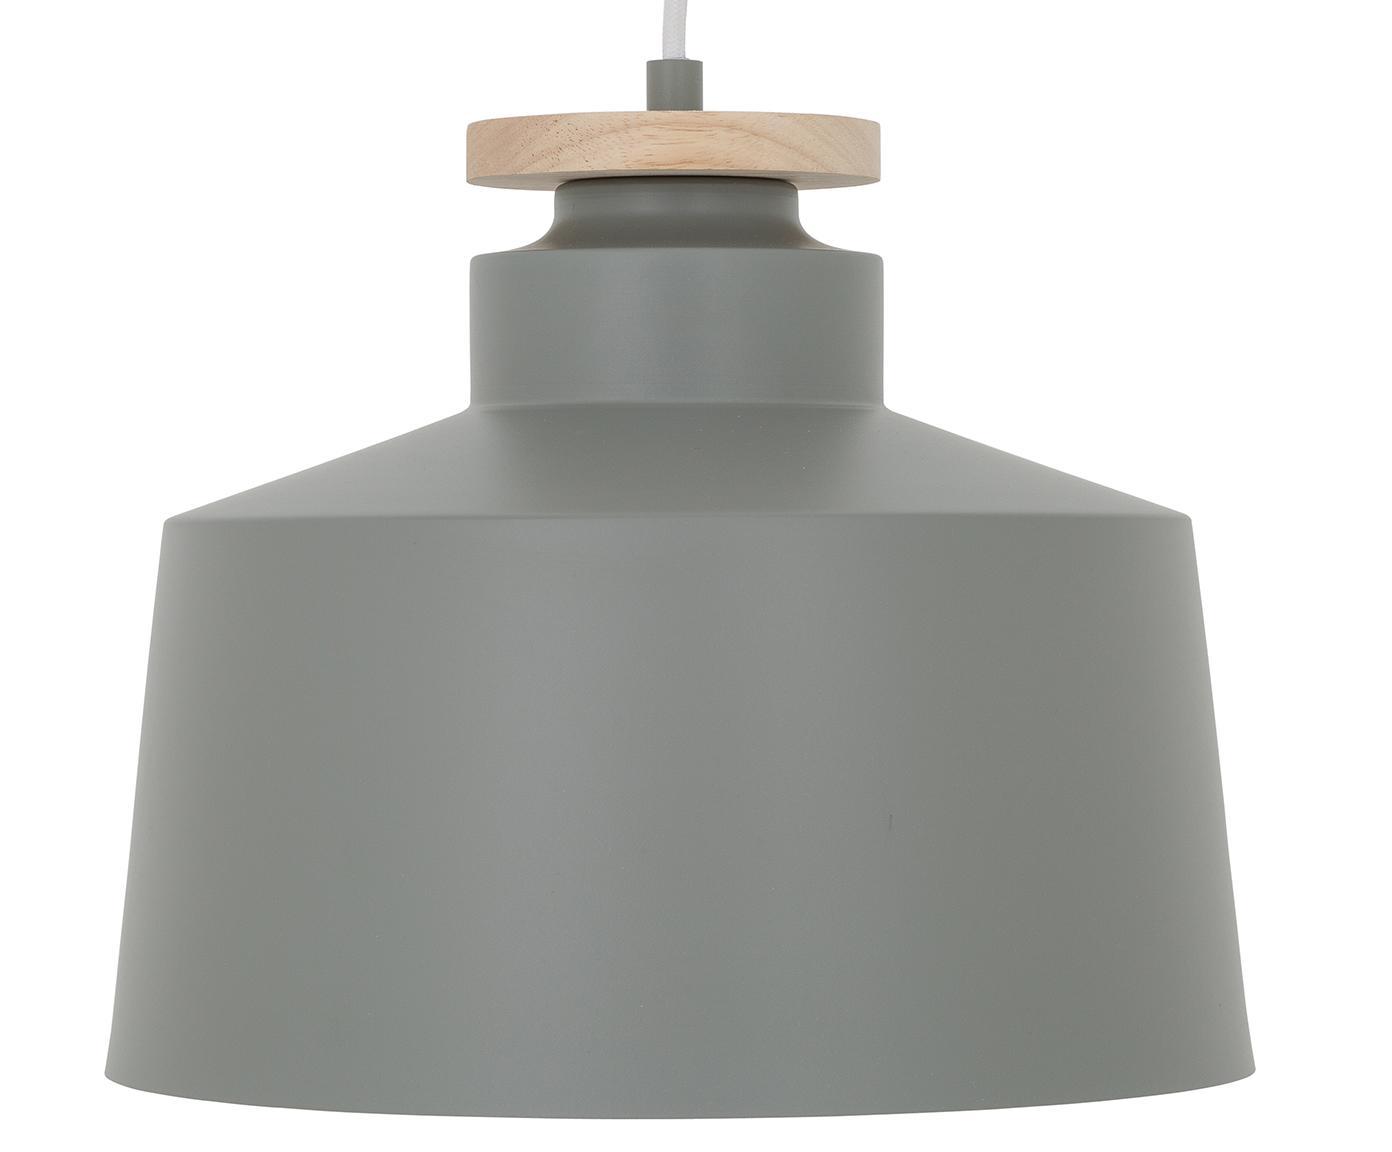 Skandi-Pendelleuchte Malm, Lampenschirm: Metall, Holz, Baldachin: Metall, Grau, Ø 30 x H 26 cm